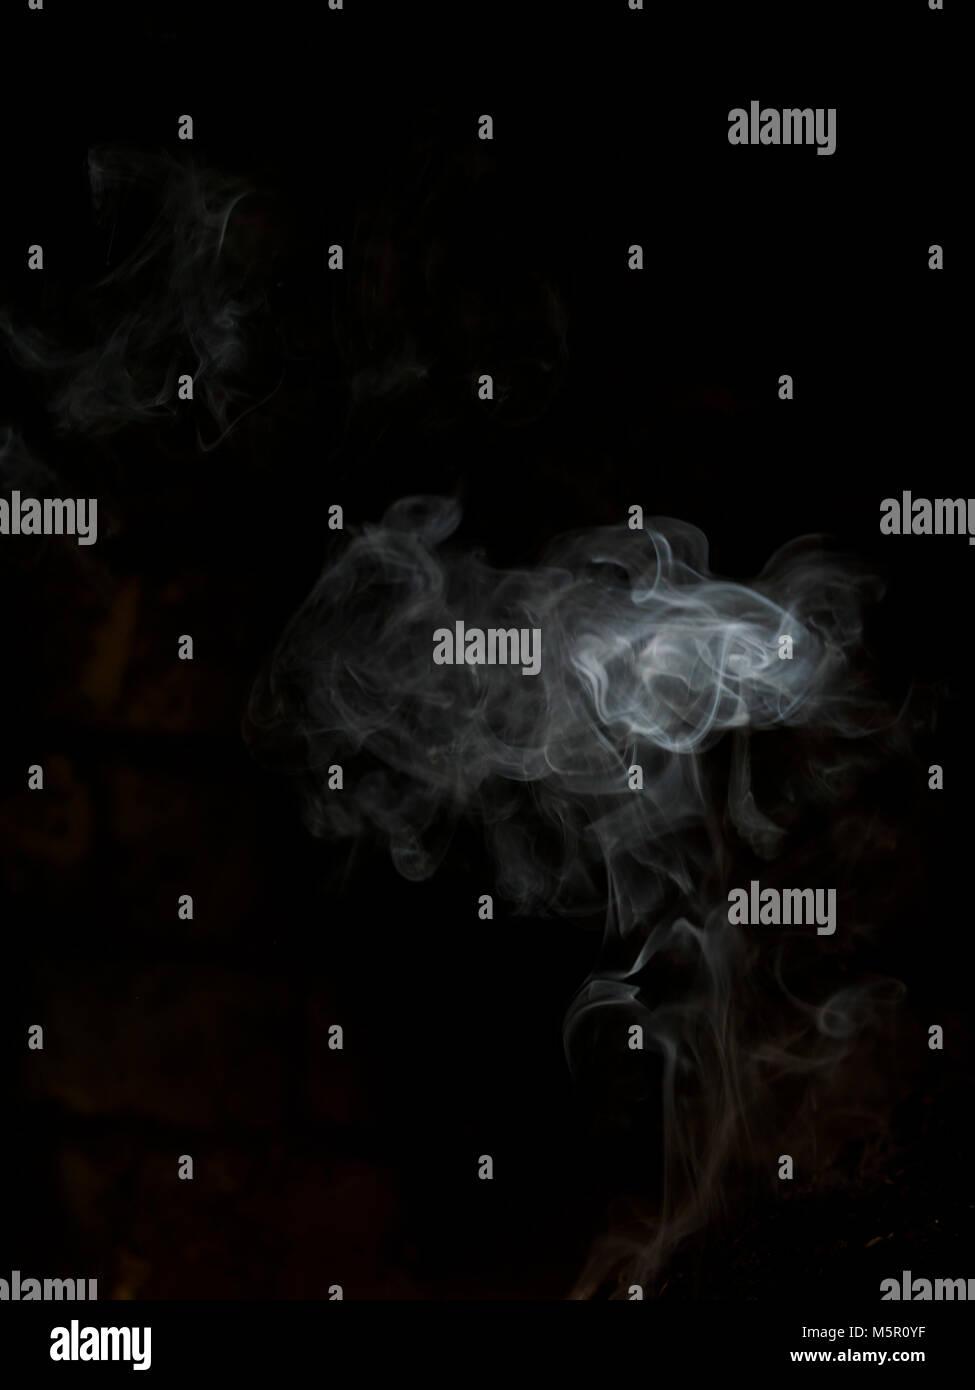 Smoke wreath for Photoshop composition overlay use - Stock Image